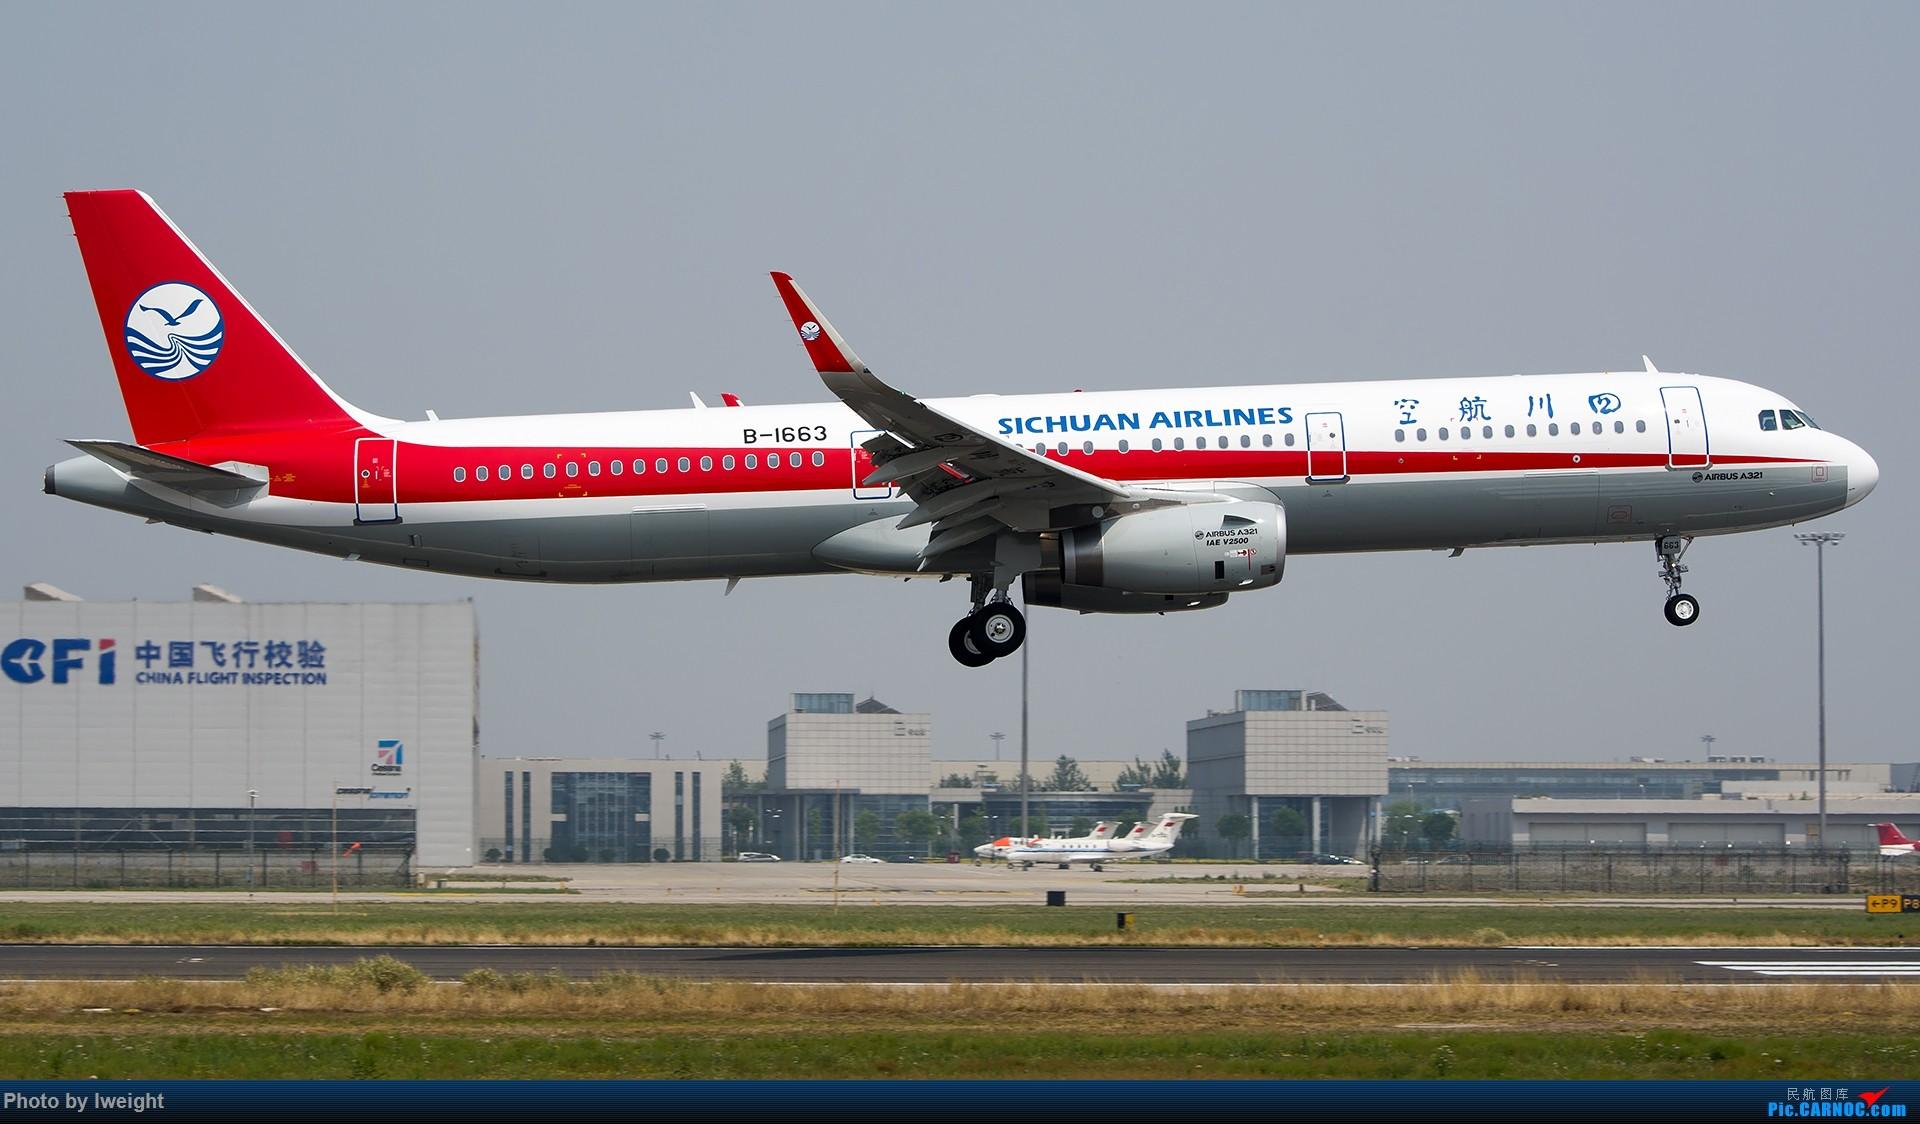 Re:[原创]周末帝都霾天拍机,凑合看看吧【2015-5-23】 AIRBUS A321-200 B-1663 中国北京首都国际机场